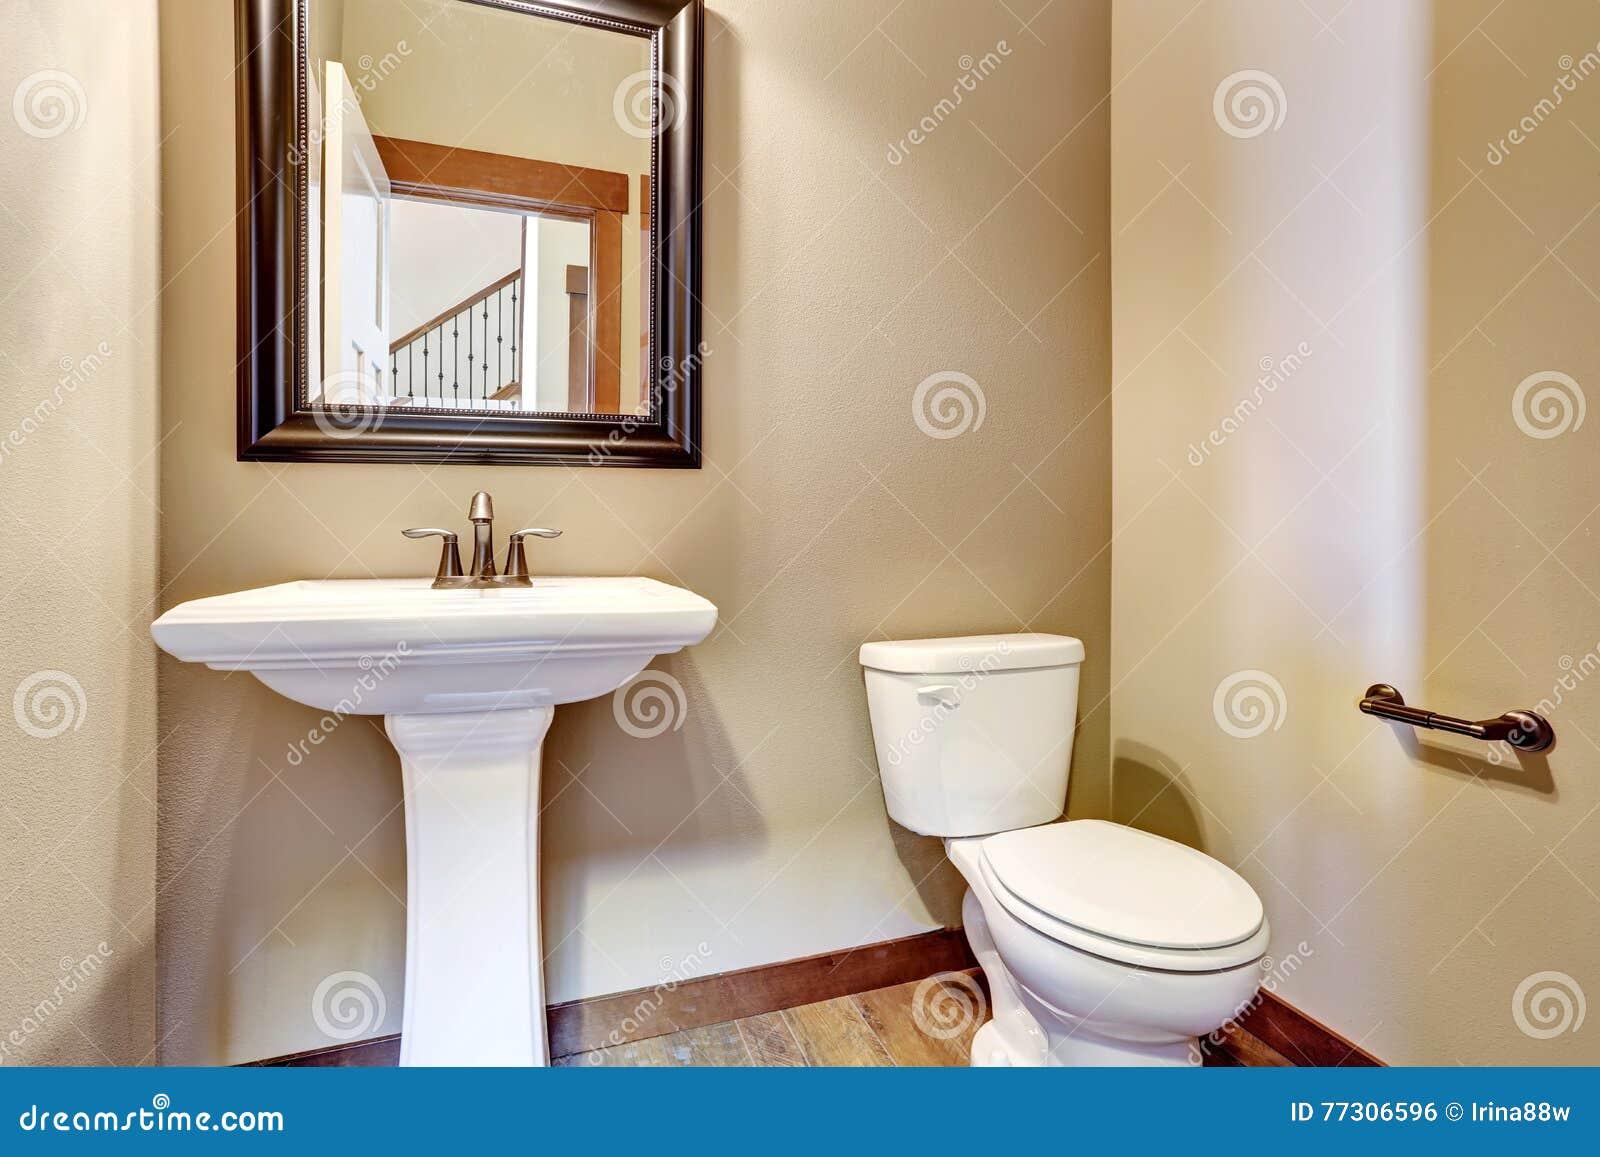 Bathroom Interior. View Of White Sink, Toilet And Mirror Stock Photo ...